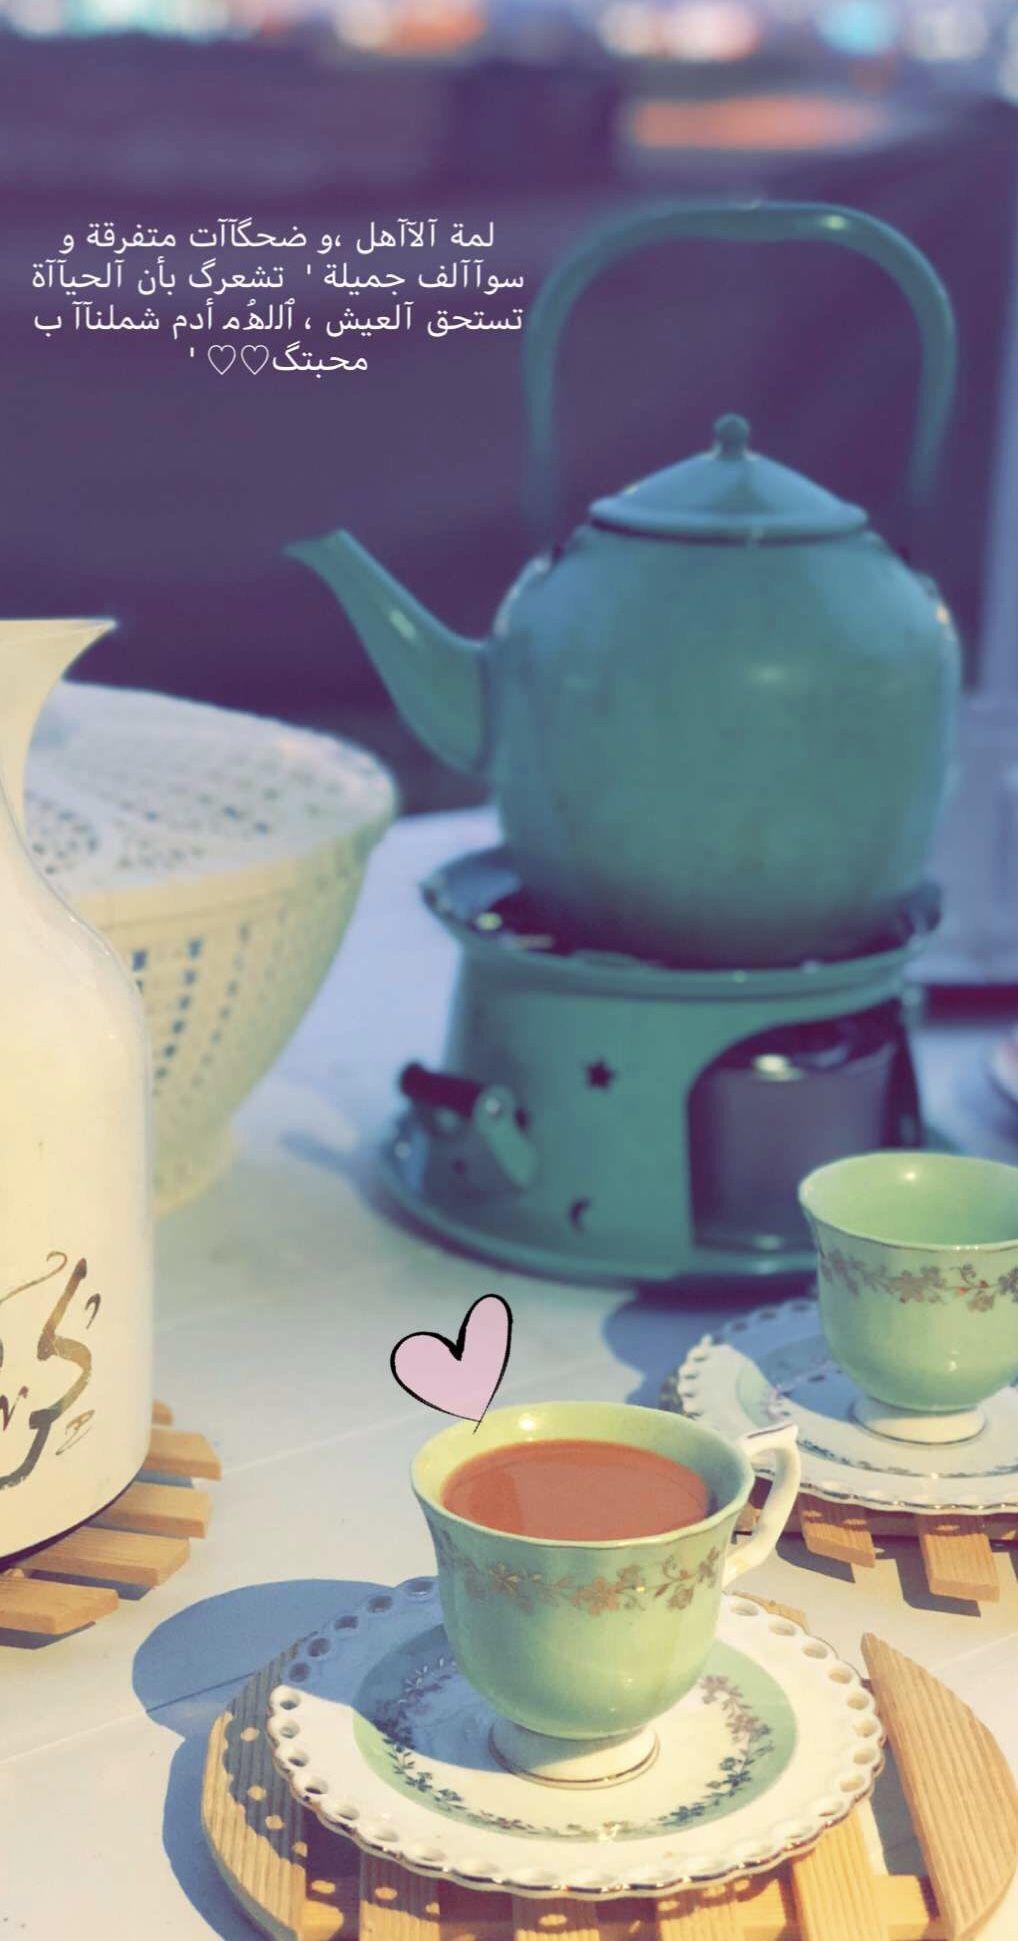 لمة تصويري شاي Tea Photography Good Evening Wishes Ispirational Quotes Cover Photo Quotes